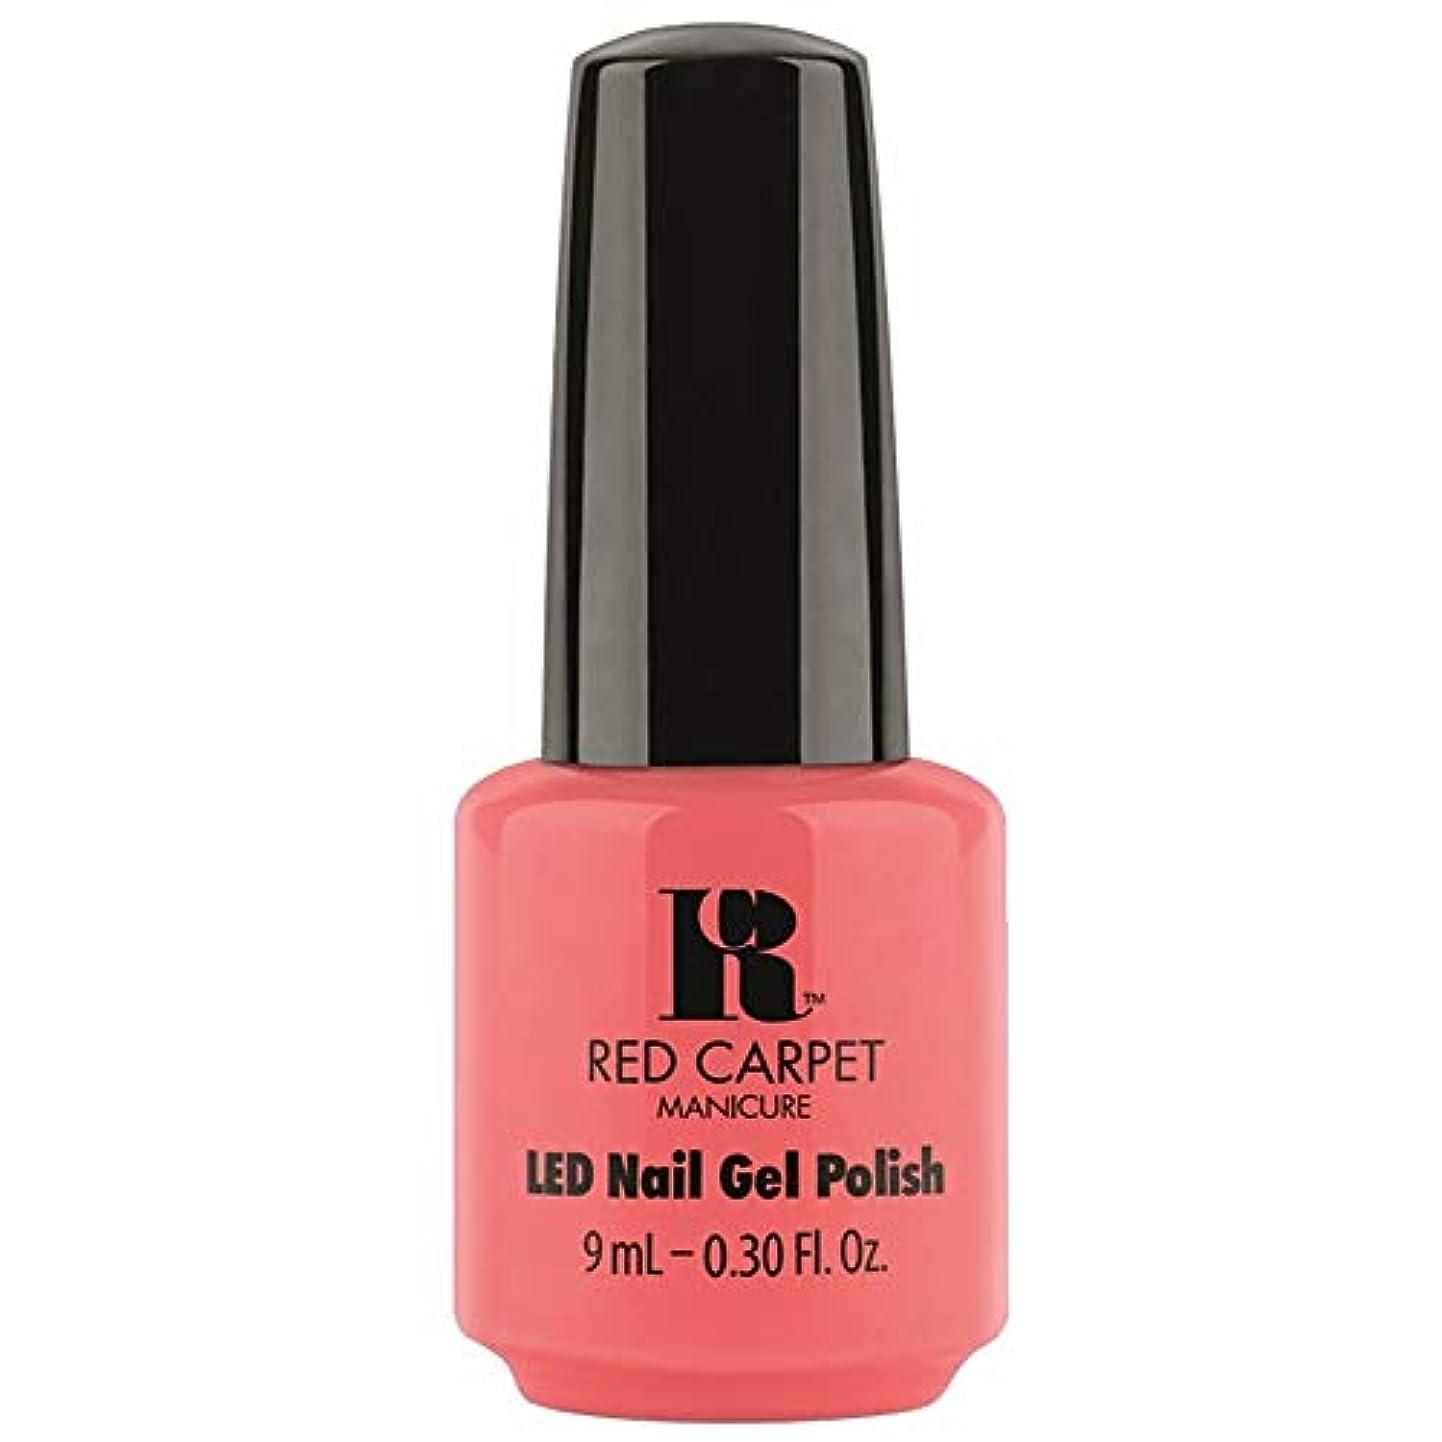 Red Carpet Manicure - LED Nail Gel Polish - Until the Sun-Sets - 0.3oz / 9ml